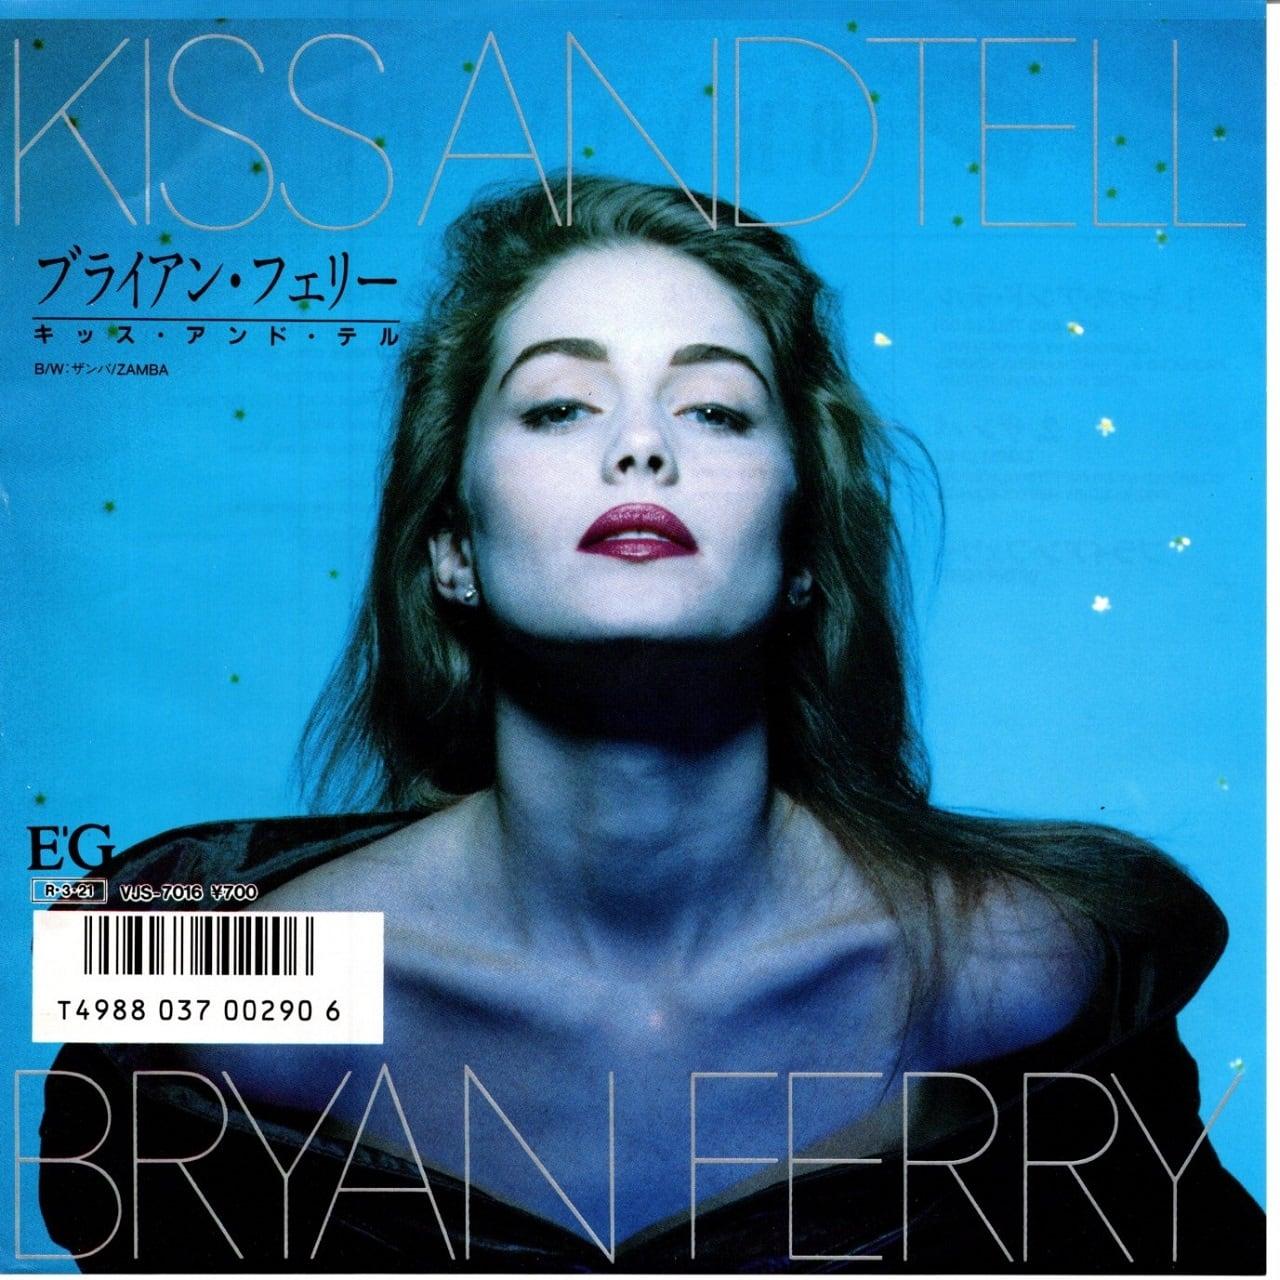 【7inch・国内盤】ブライアン・フェリー / キッス・アンド・テル